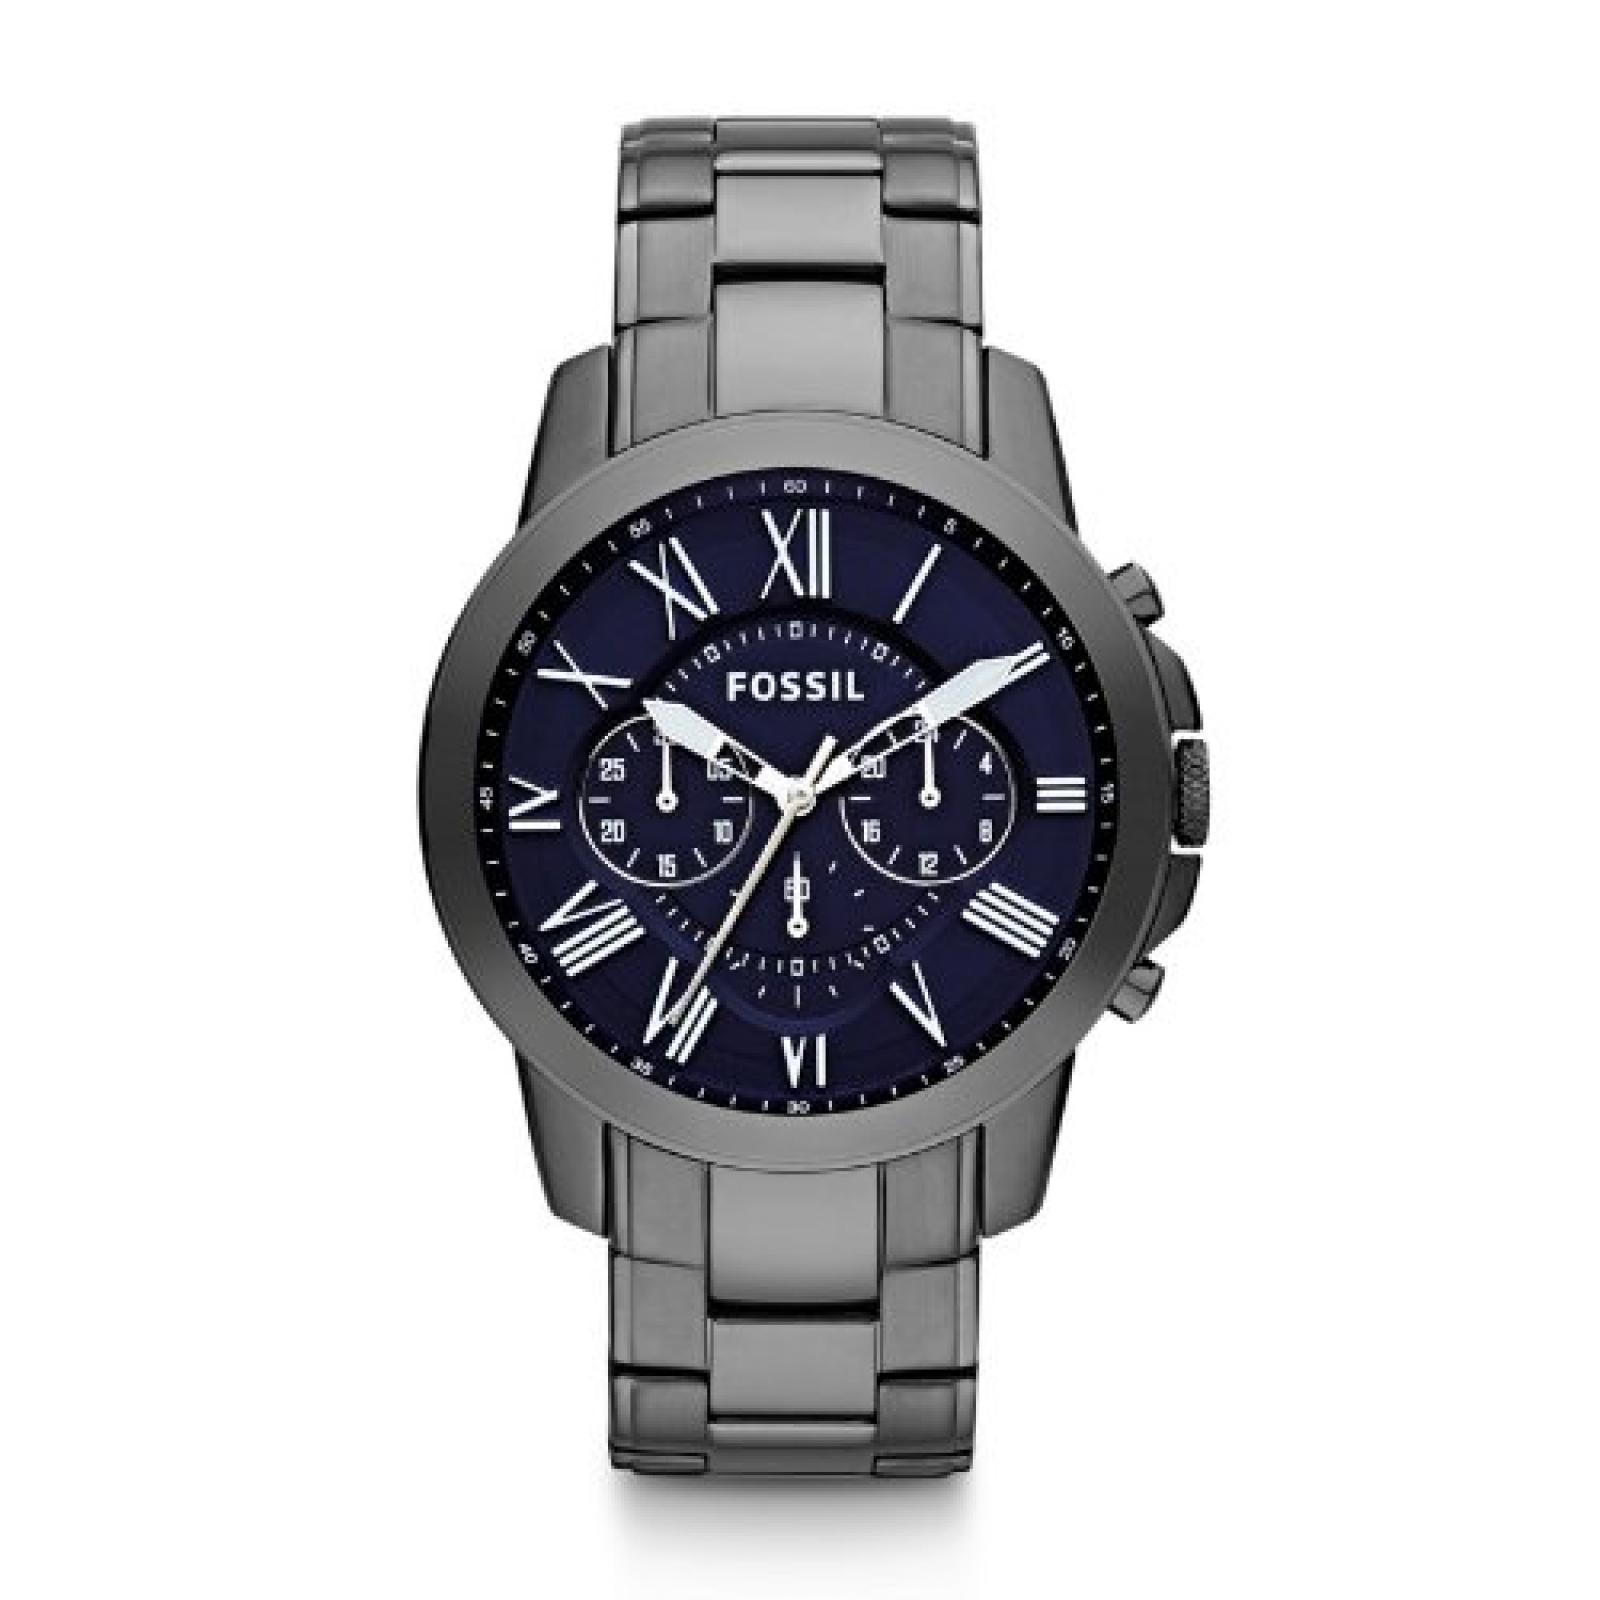 Fossil Herren-Armbanduhr XL Chronograph Quarz Edelstahl FS4831